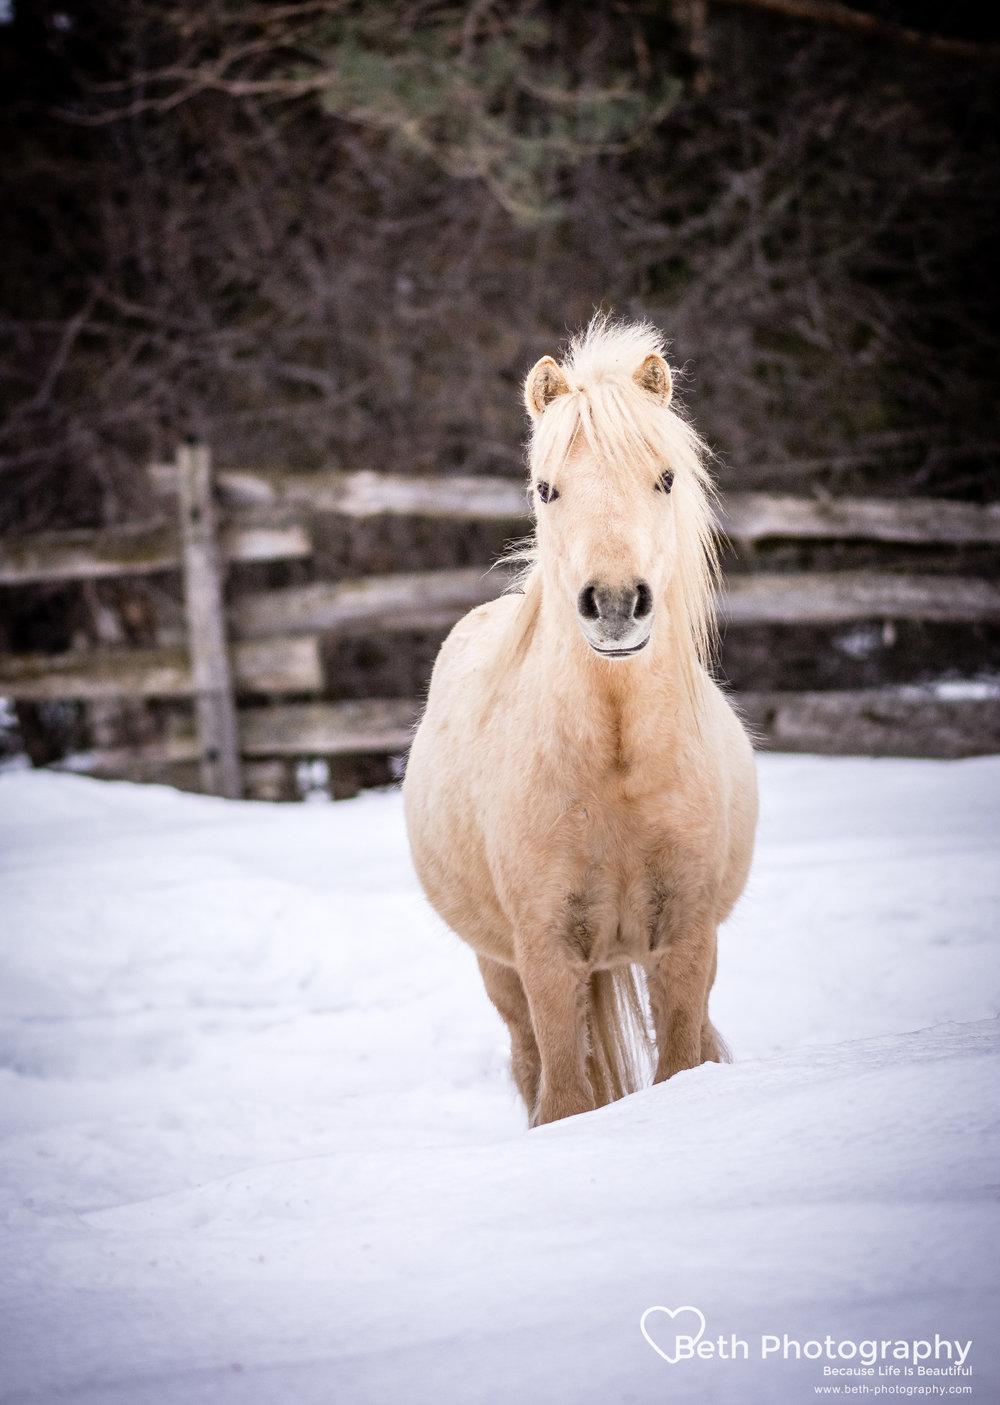 Beth Photography - Pet Photographer -Servicing Ottawa to Cornwall-79.jpg